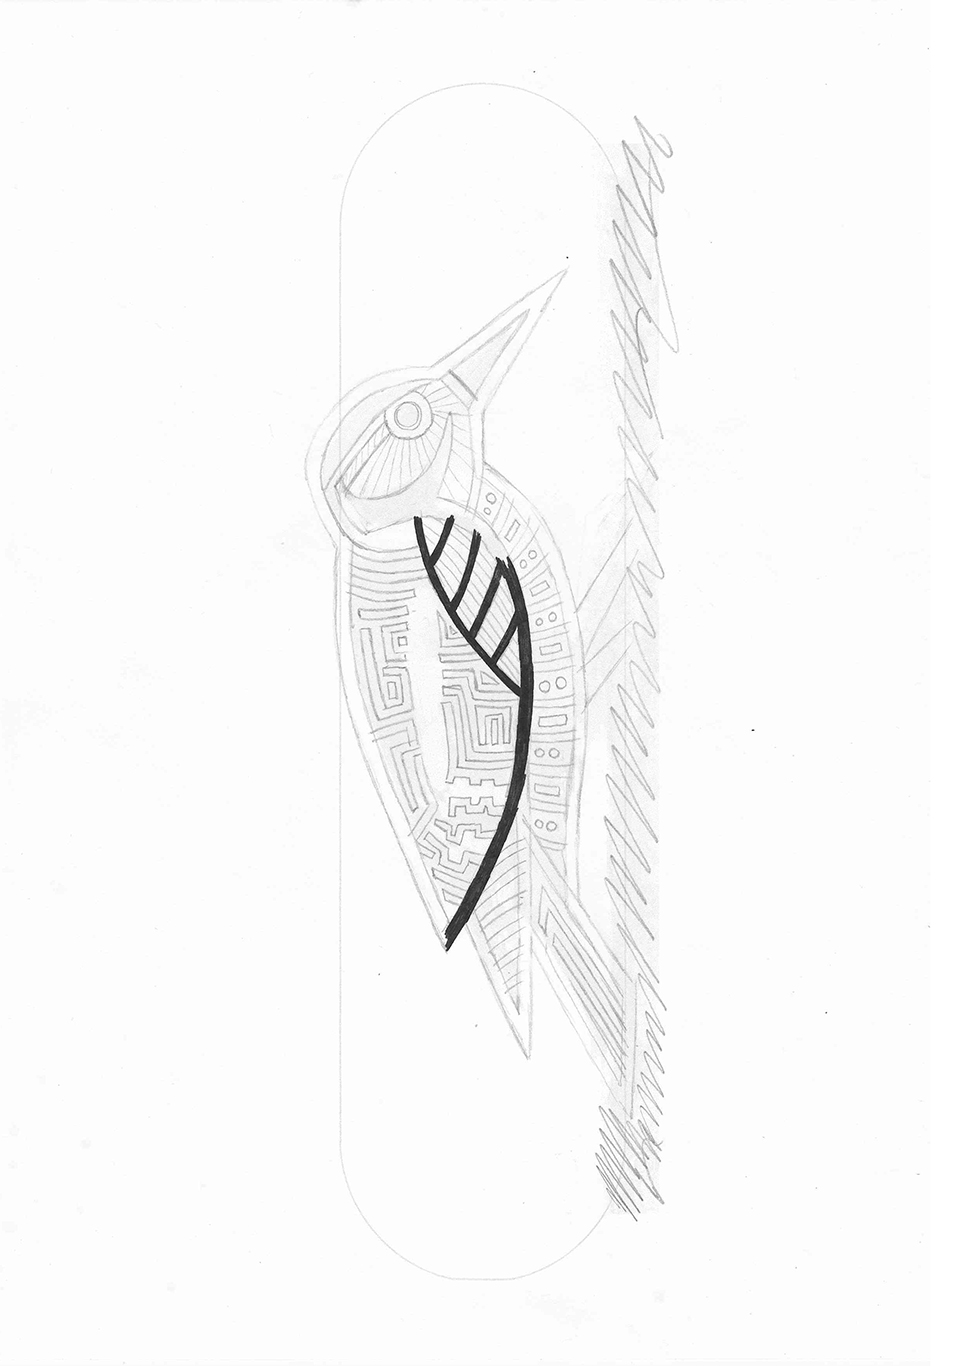 freakart_lv_victorinox_ilustracija_dizains_produkts_11